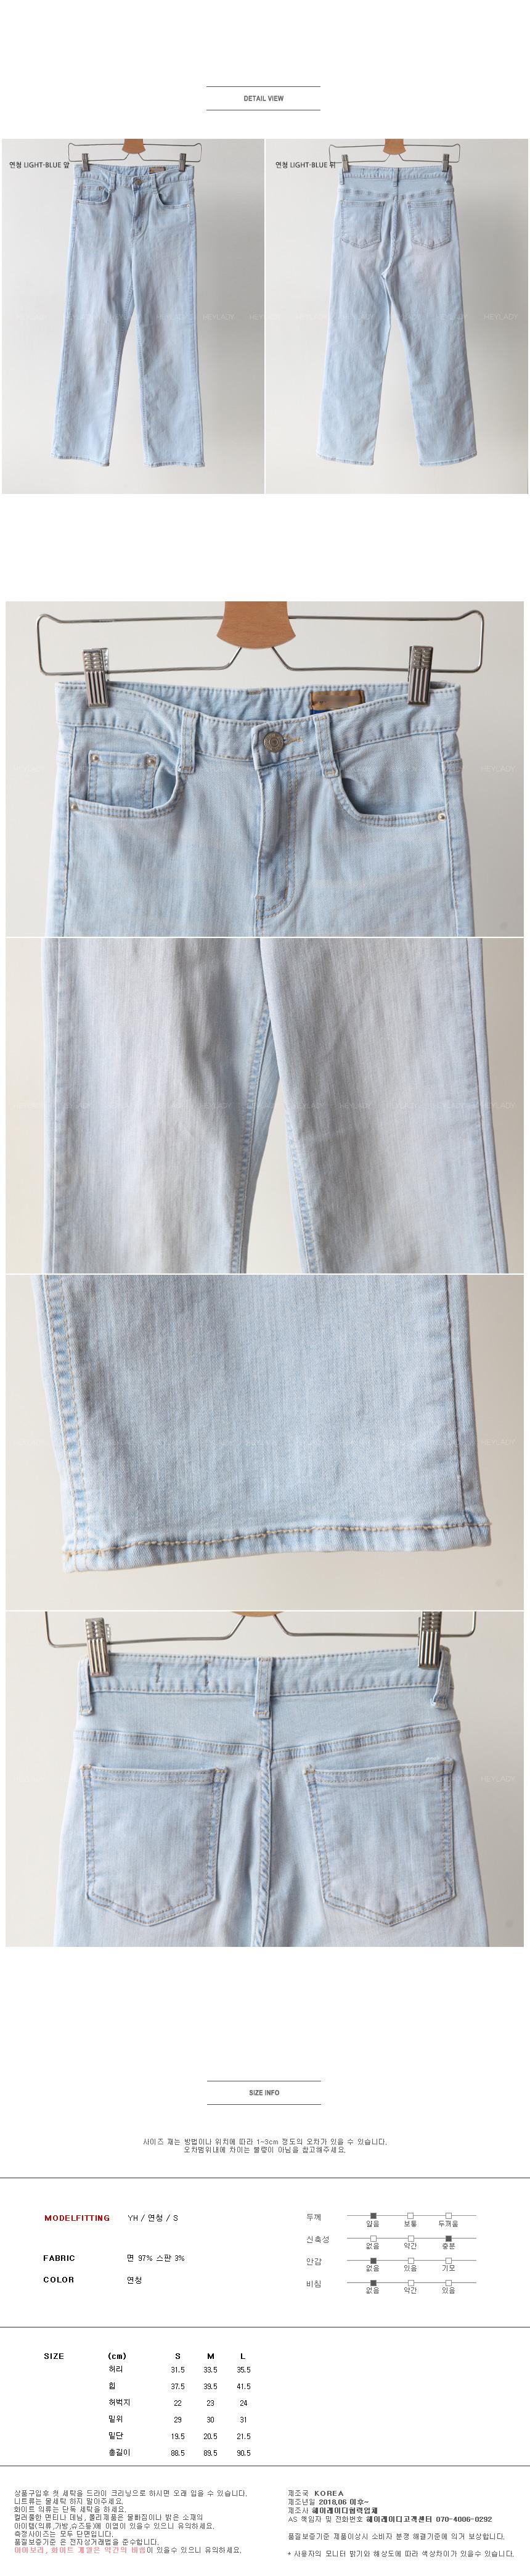 Flesh straight denim pants